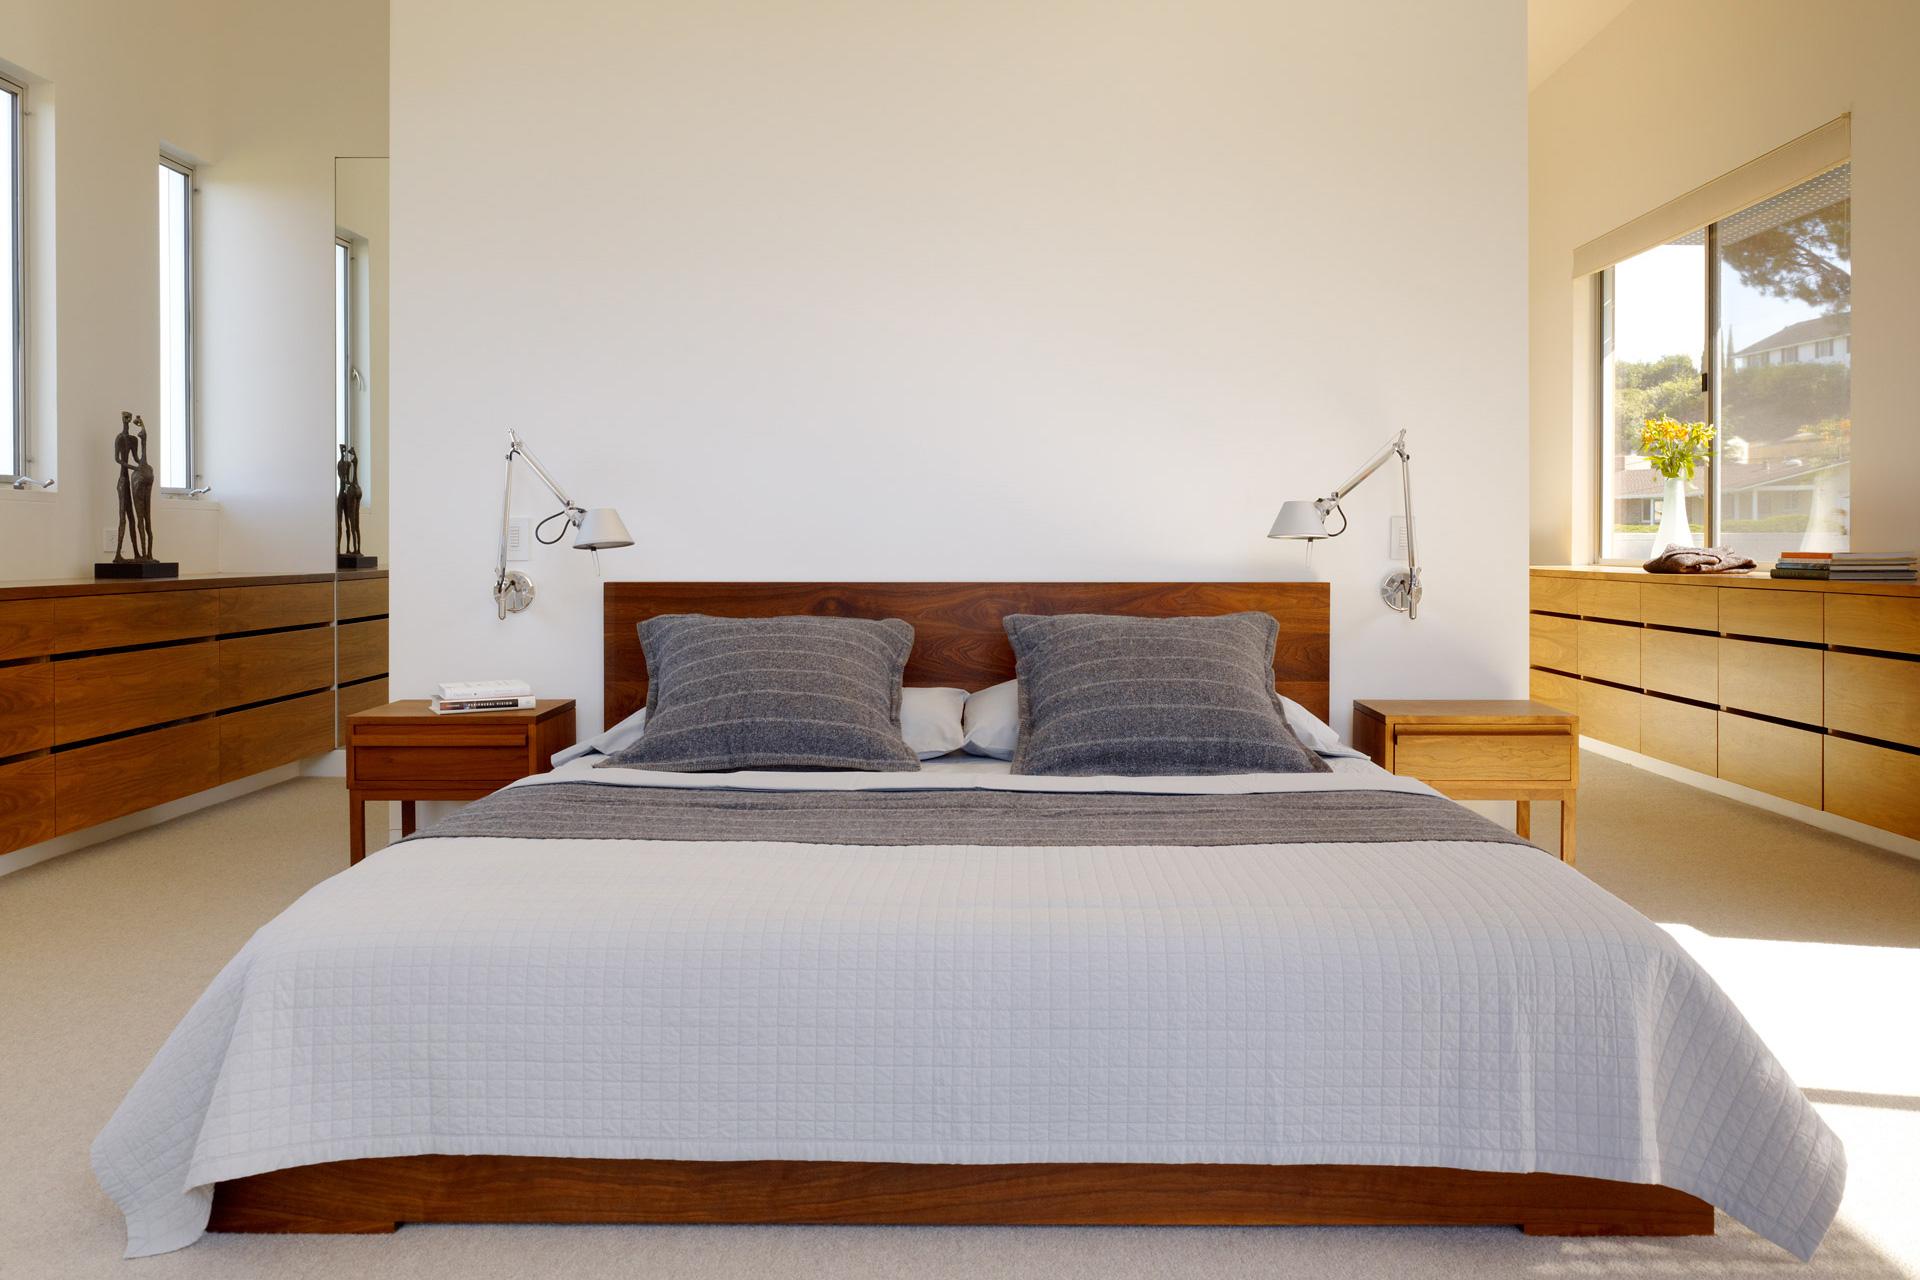 Los Altos Hills Residence design